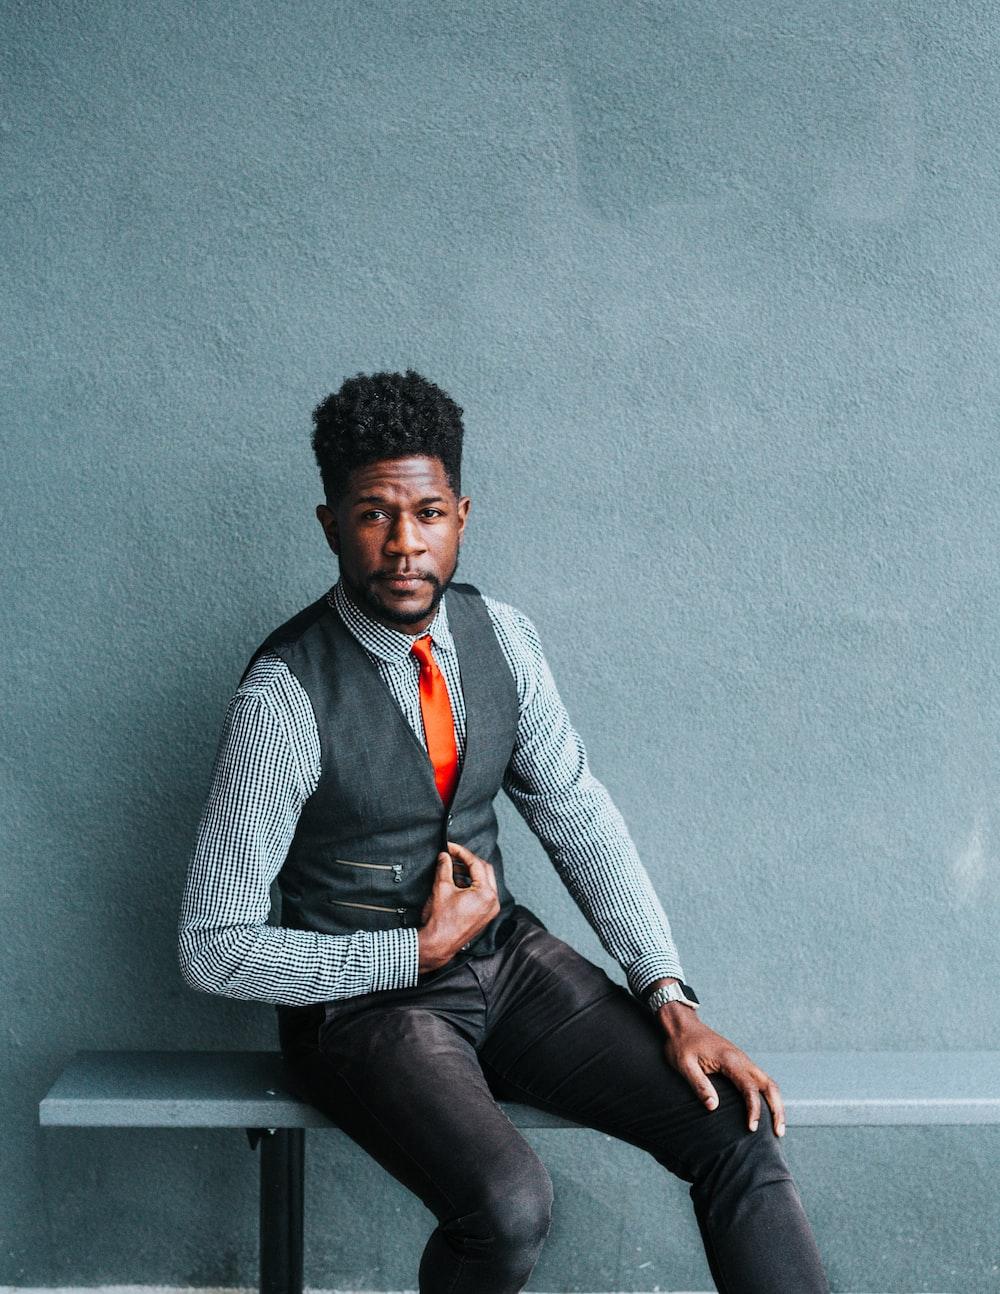 man wearing vest sitting on bench